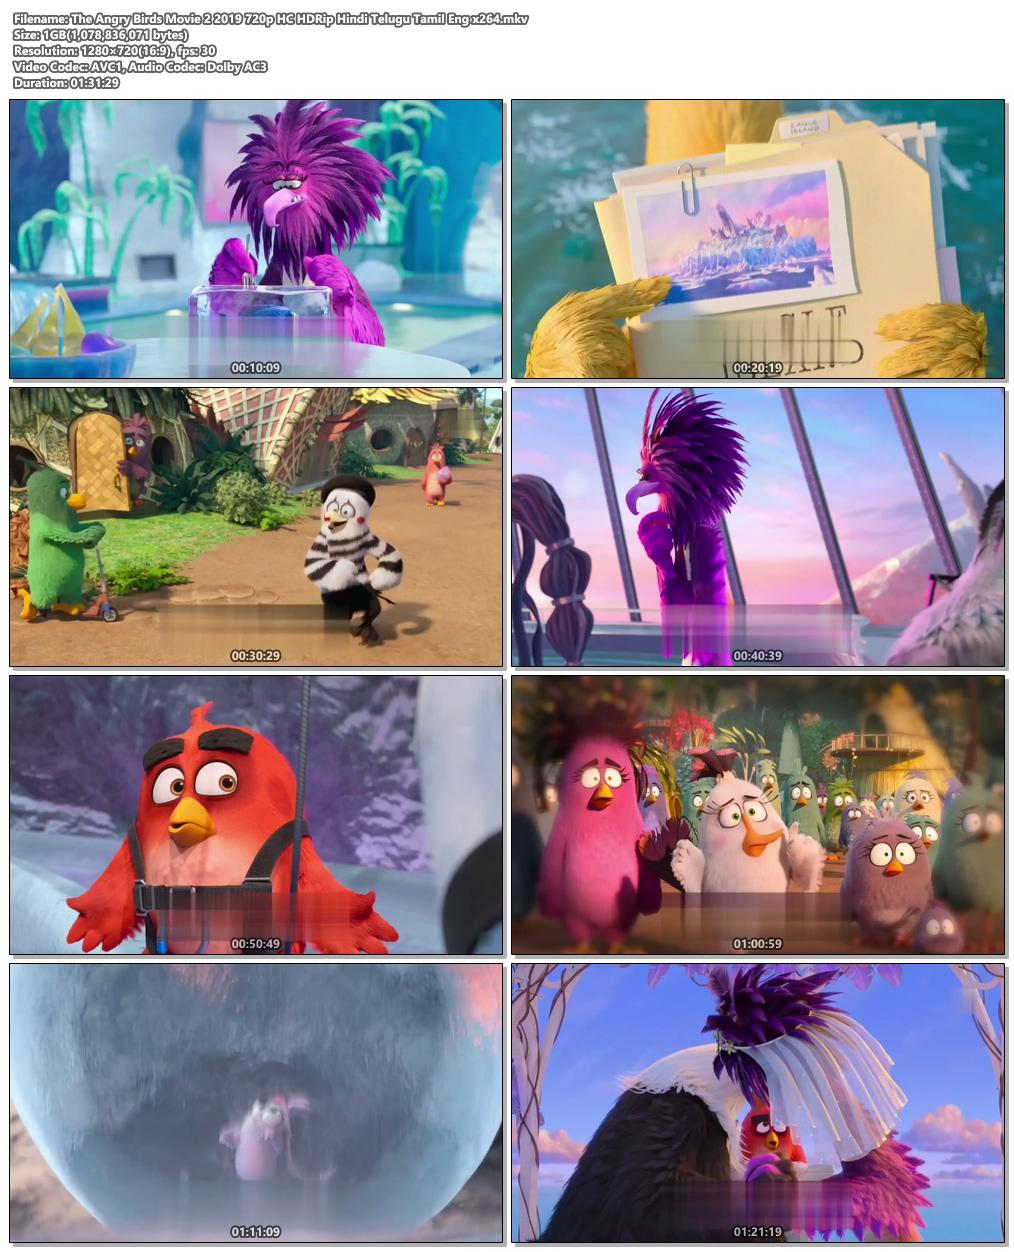 The Angry Birds Movie 2 2019 720p HC HDRip Hindi Telugu Tamil Eng | 480p 300MB | 100MB HEVC Screenshot